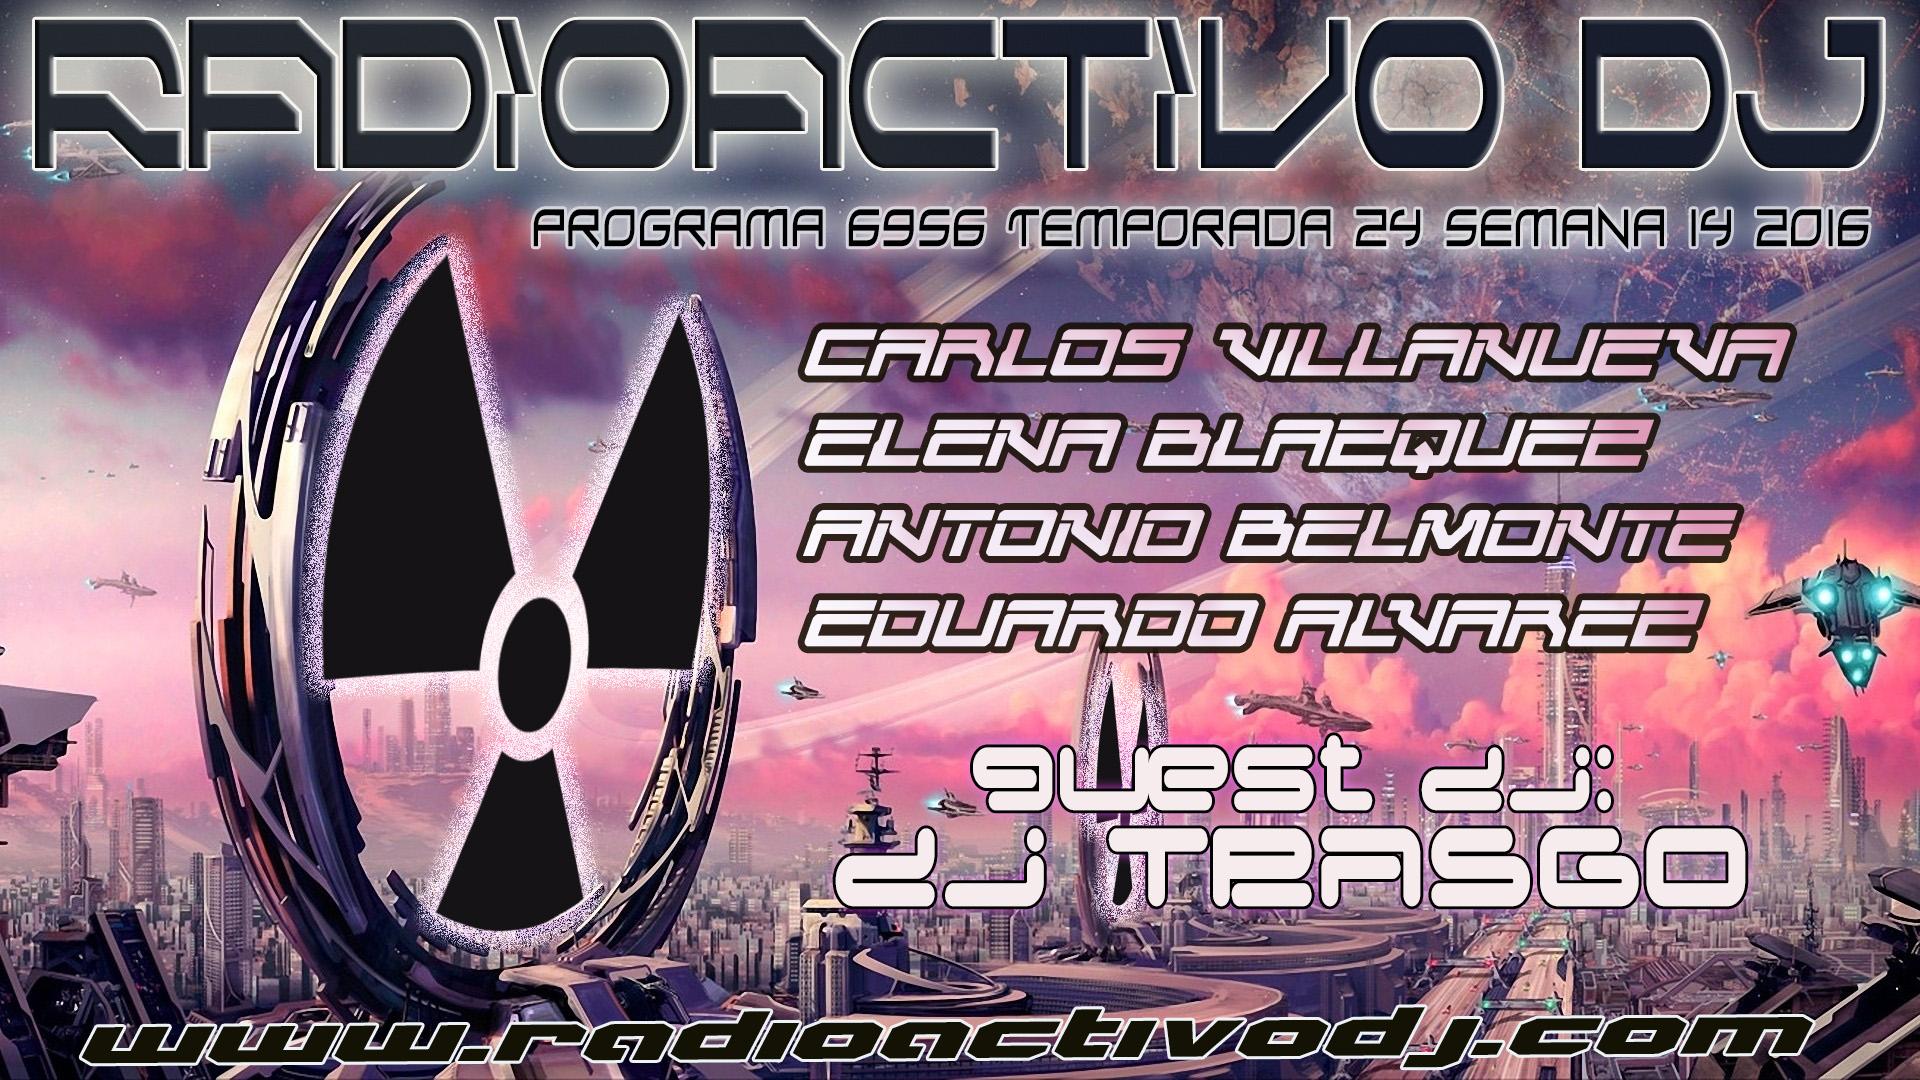 RADIOACTIVO DJ 14-2016